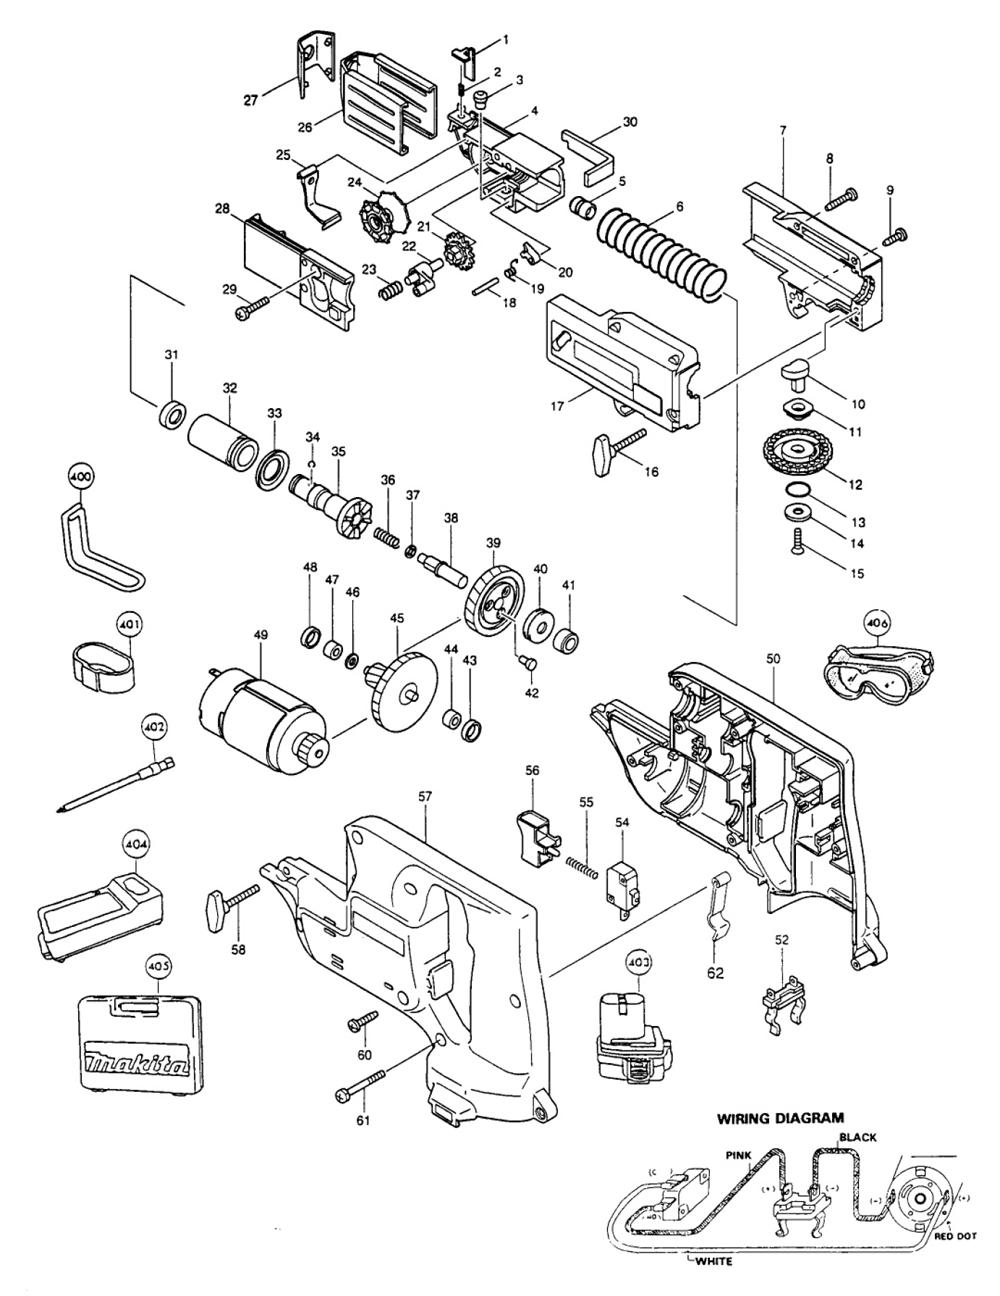 Cordless Makita Parts Diagram Replacement Wire Diagrams Blower Wiring 6835dwa List Repair Oem 9227c Breakdown